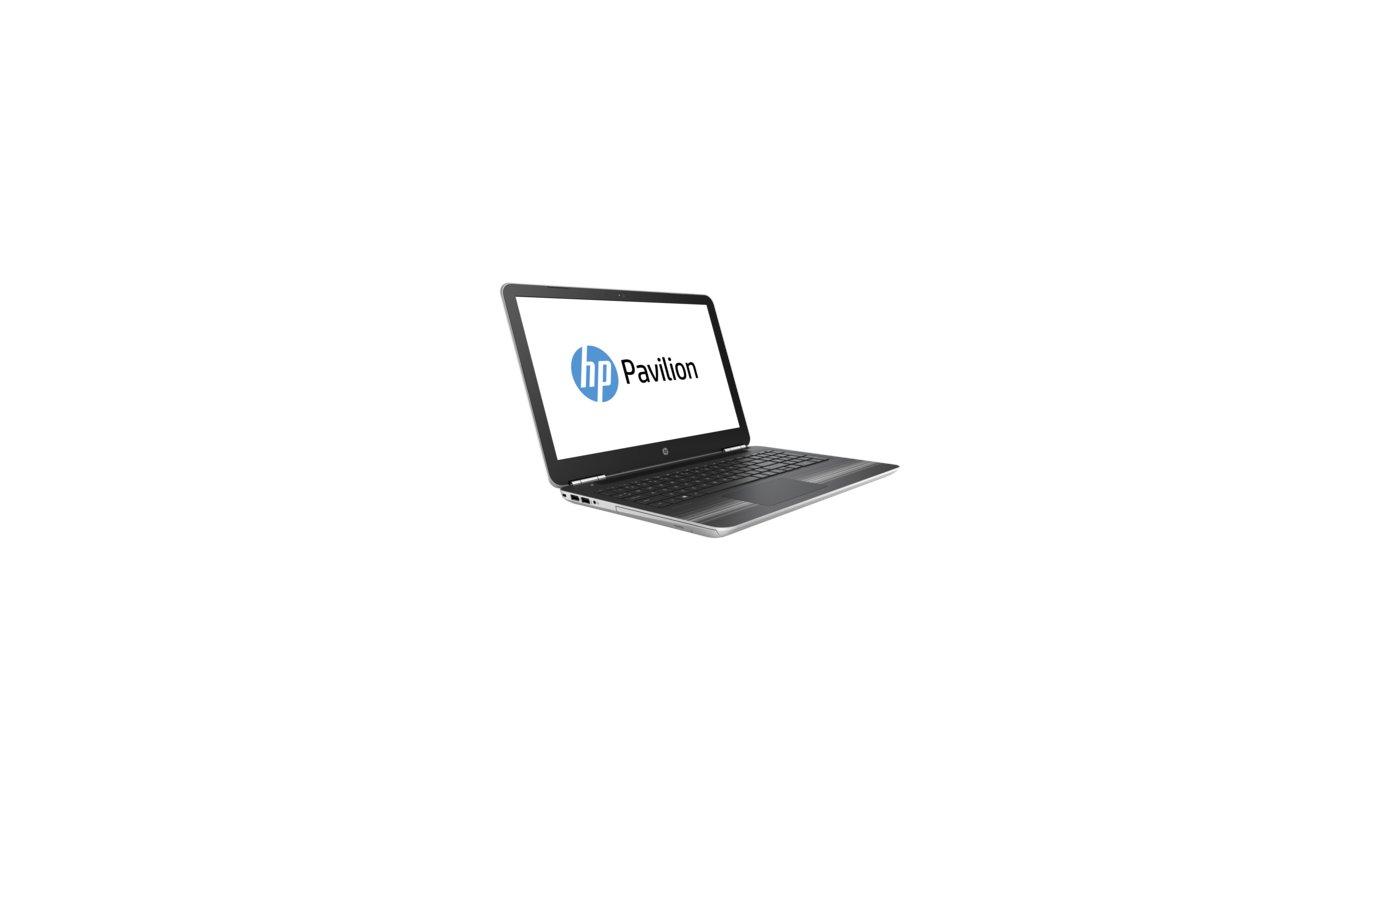 Ноутбук HP Pavilion 15-au010ur /X3N36EA/